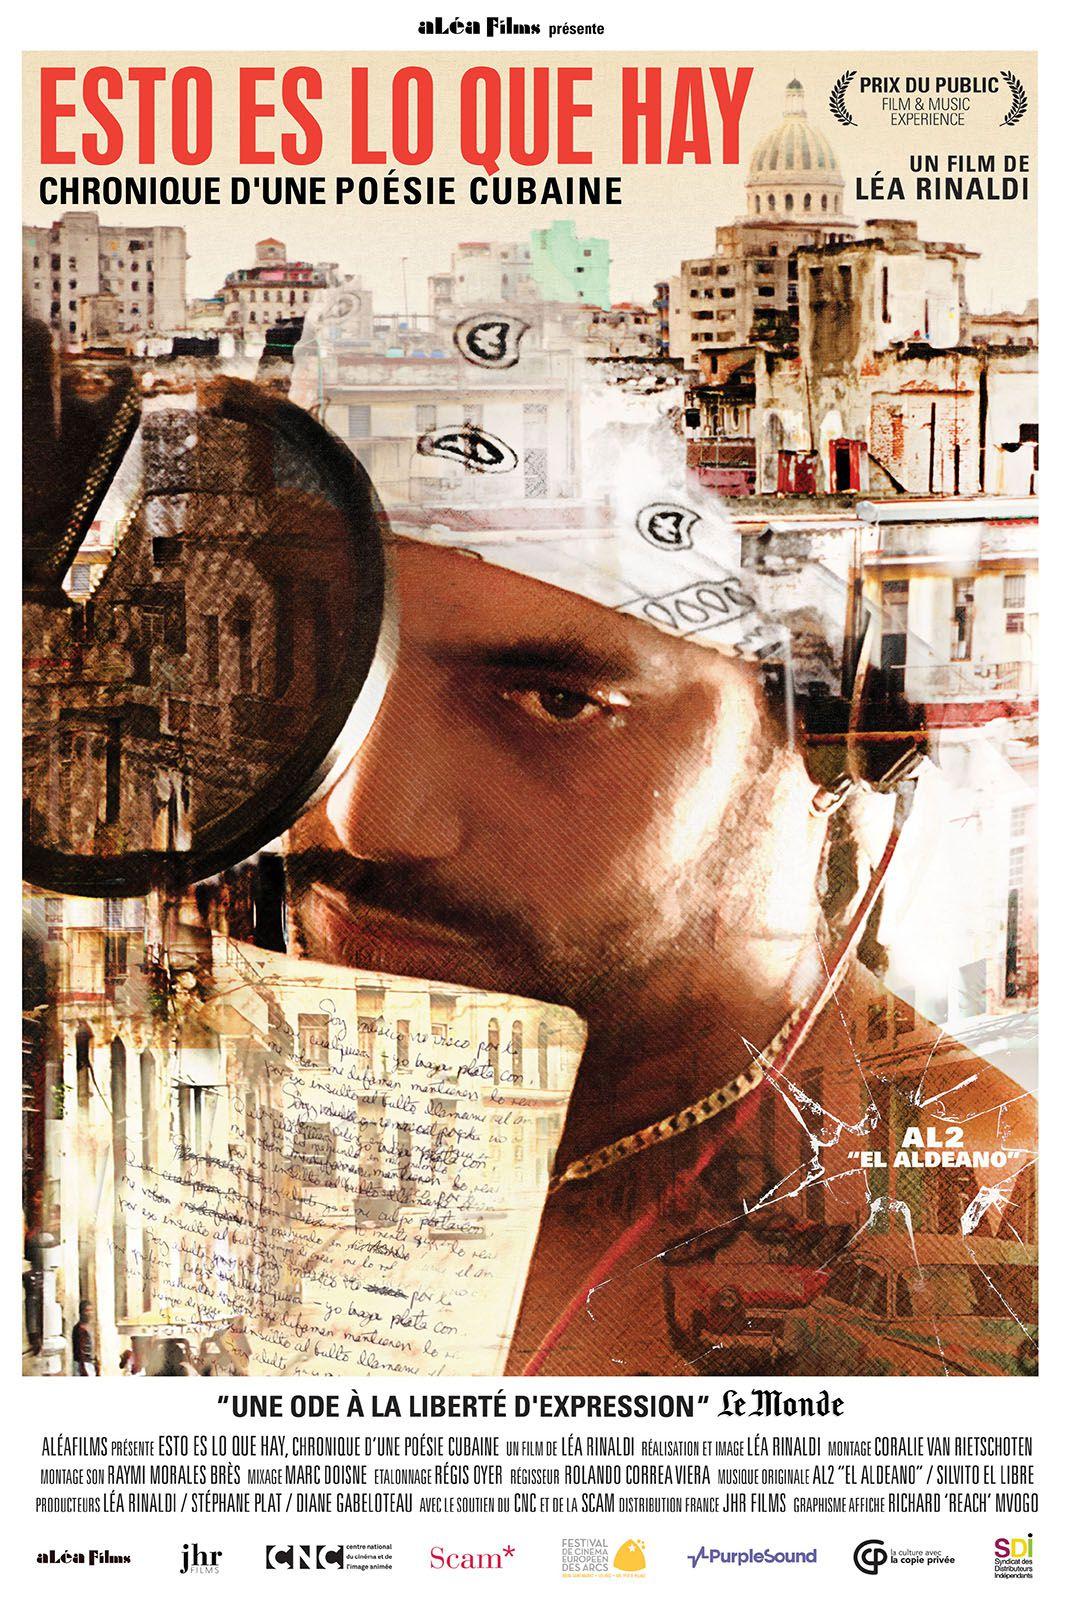 Esto es lo que hay : Chronique d'une poésie cubaine - Documentaire (2015)